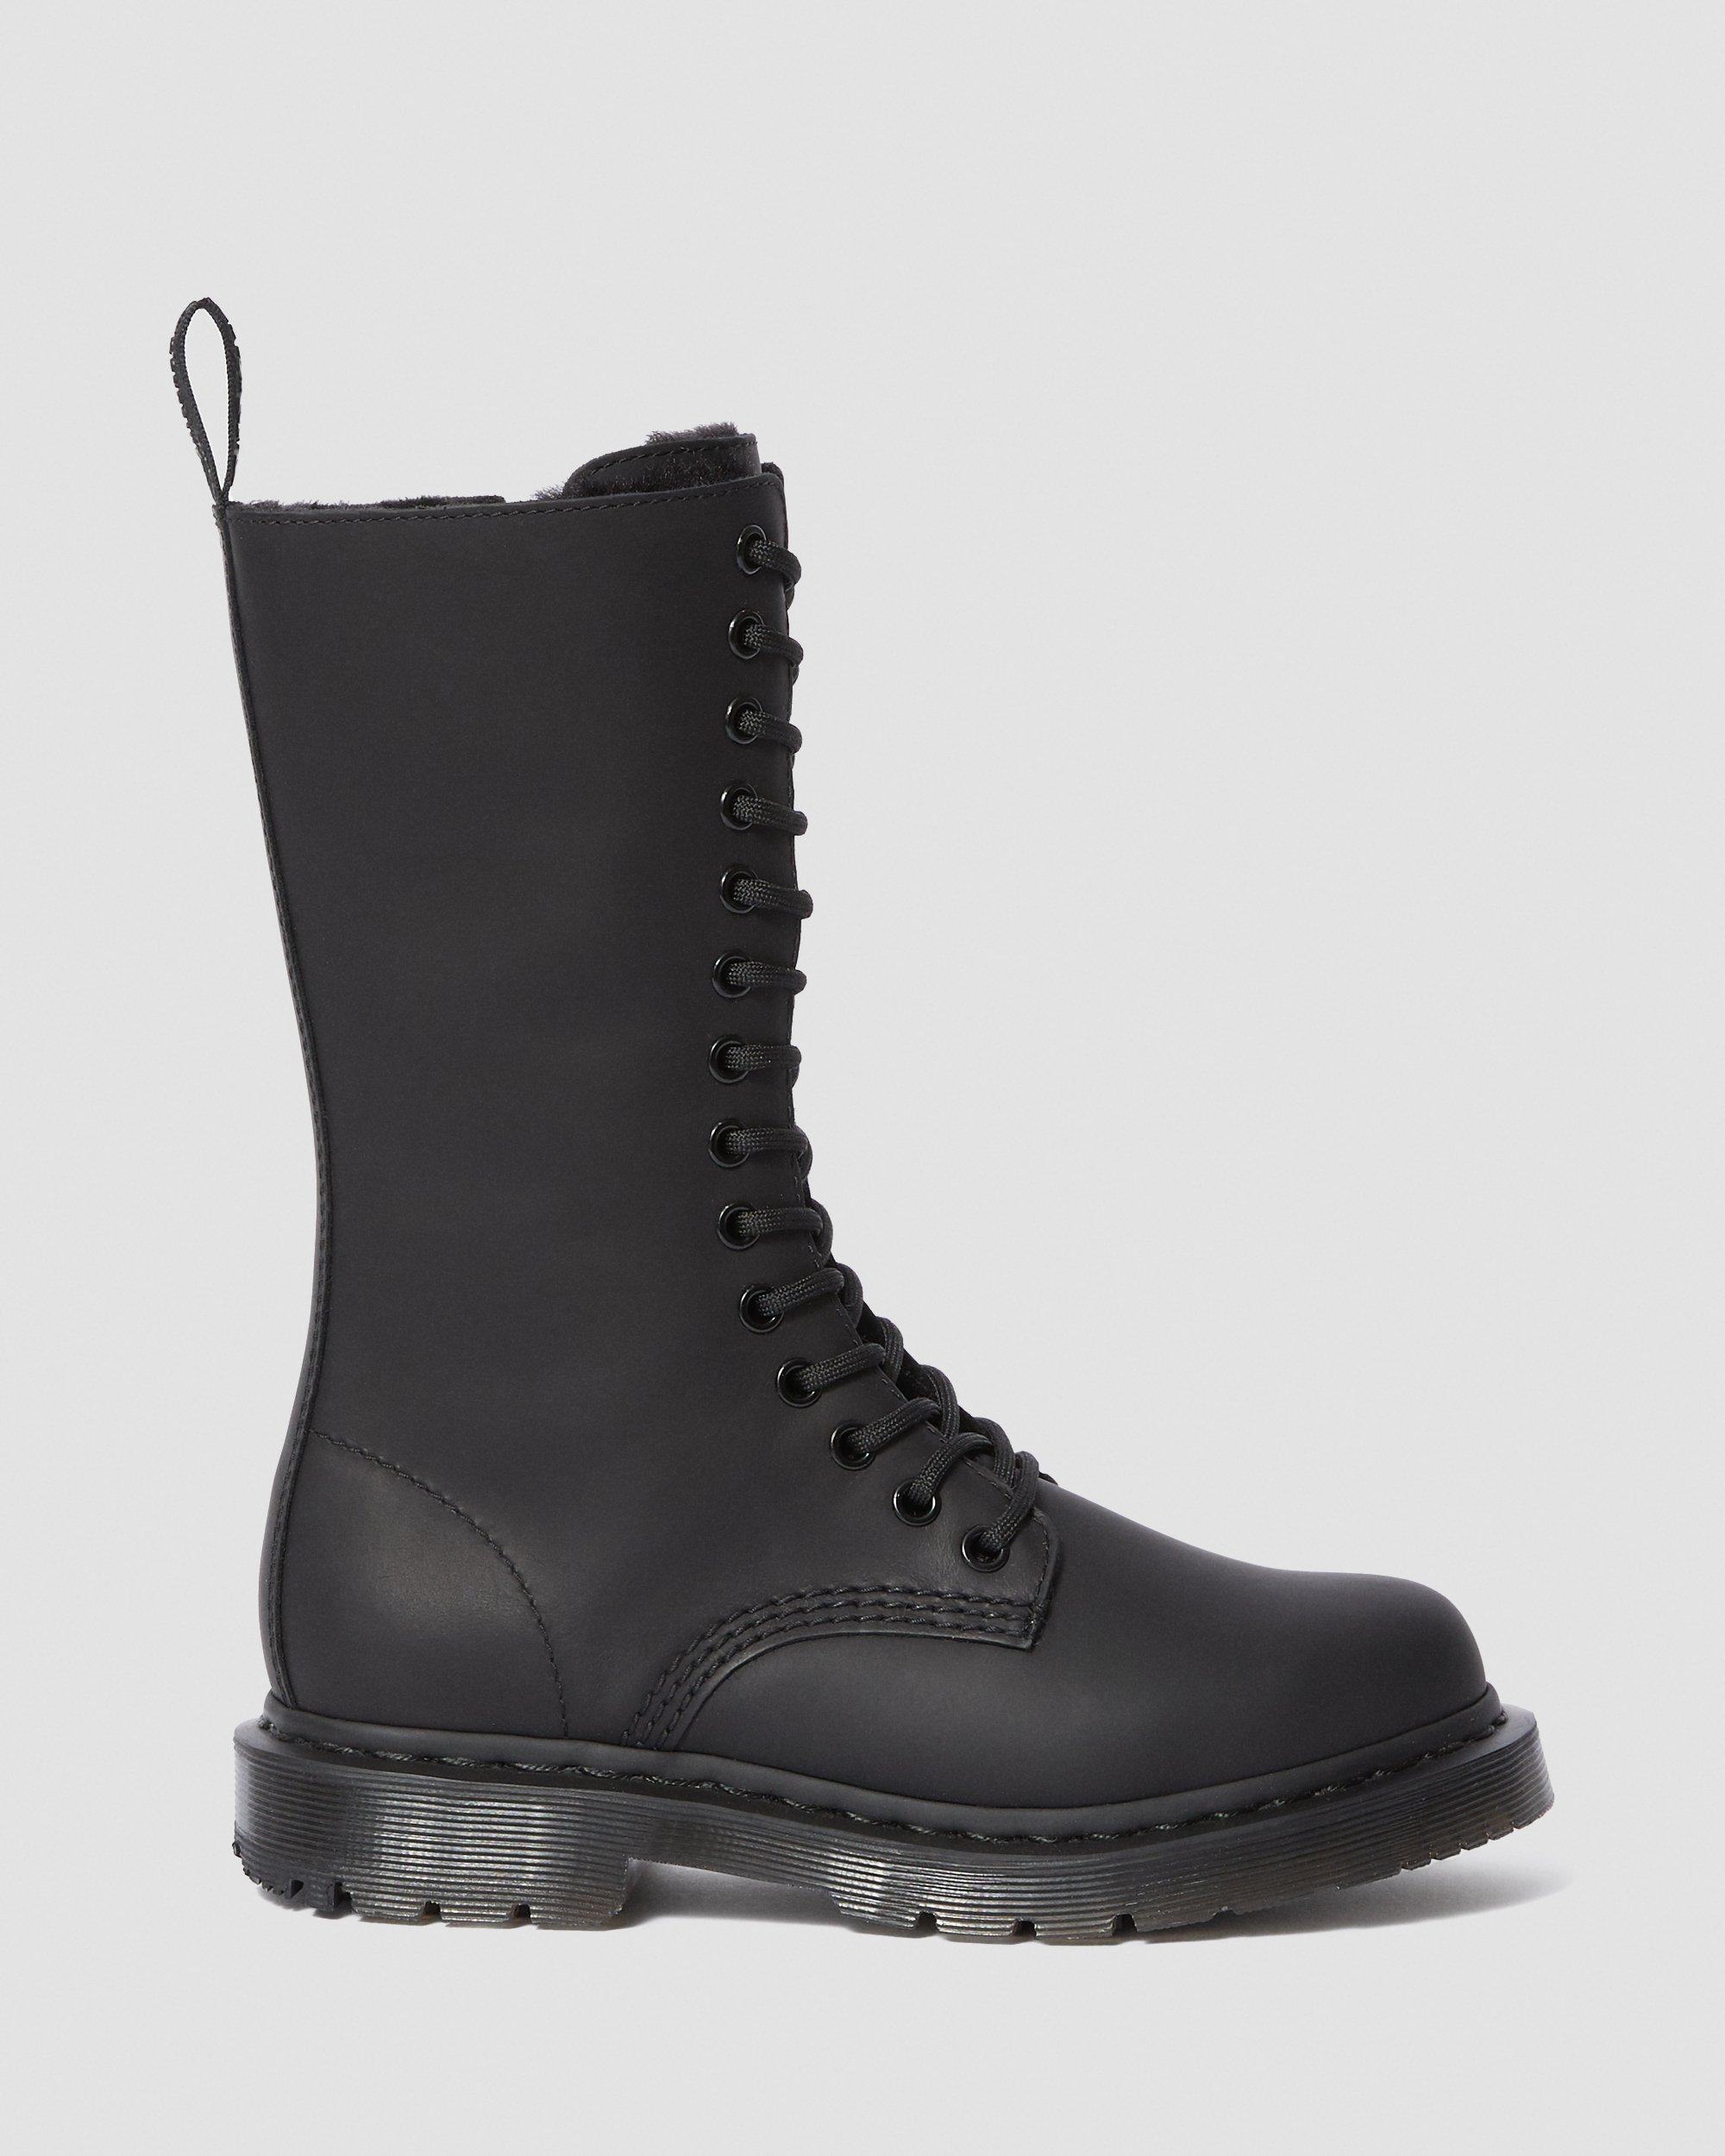 1460 Kolbert Wintergrip Boots